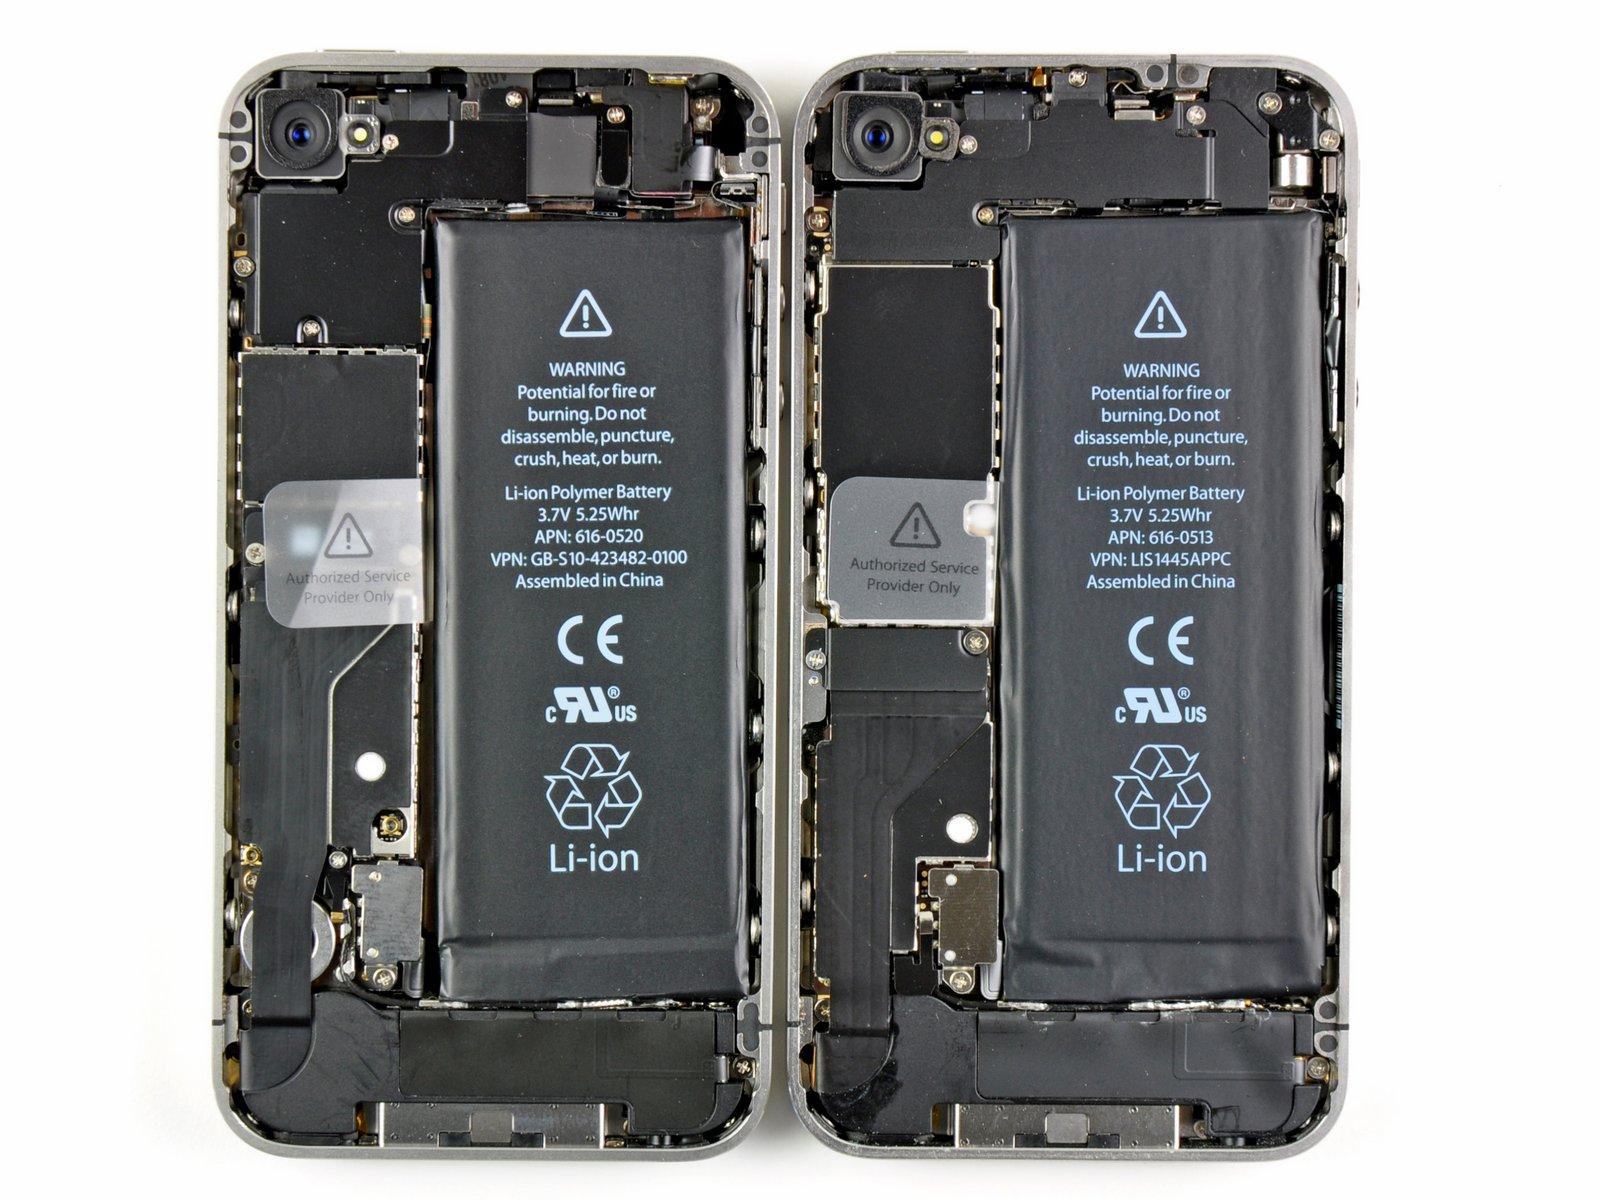 iPhone 4 teardown internals comparison